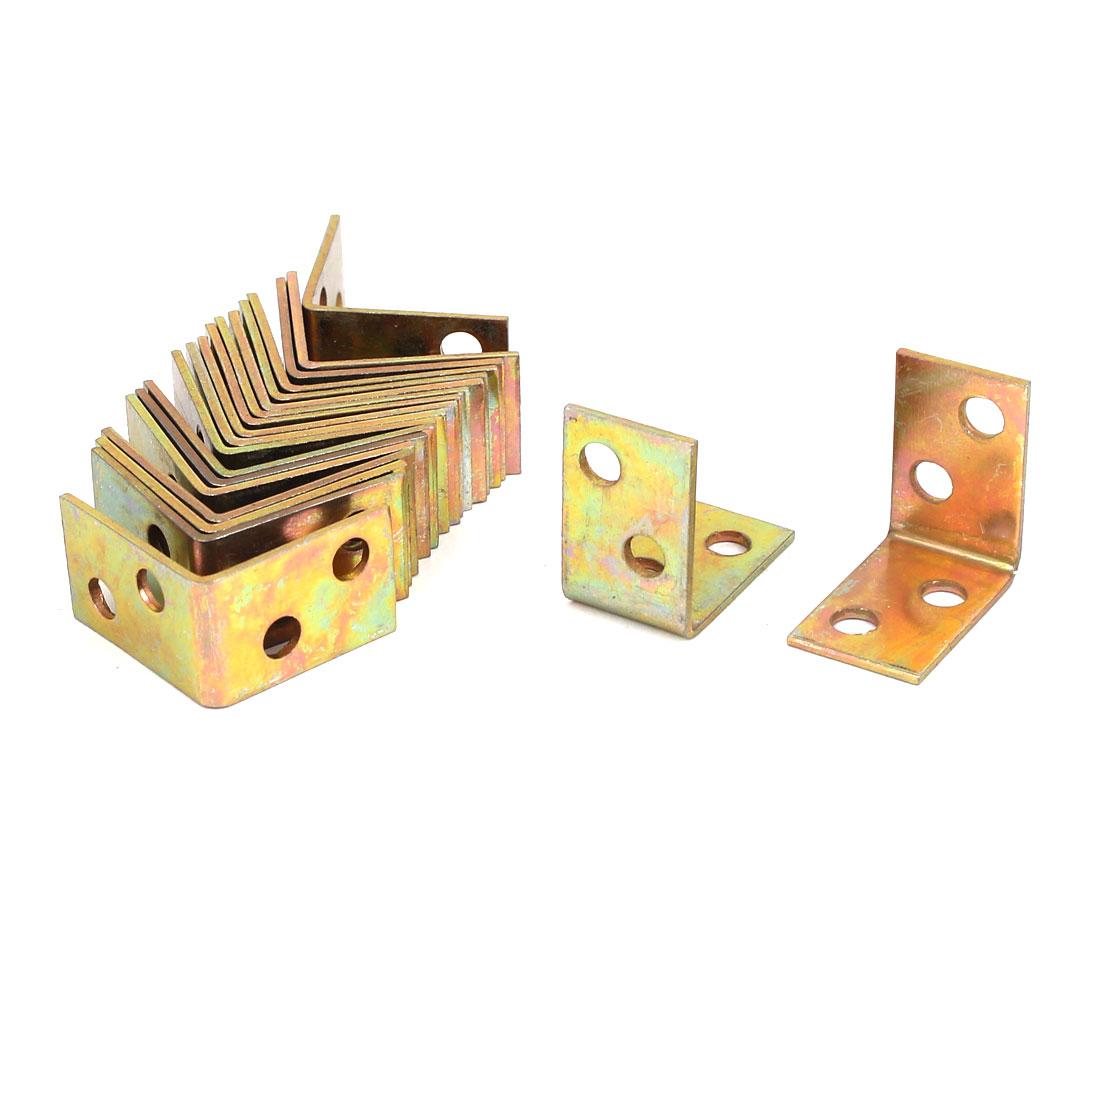 25mmx25mmx16mm 4 Holes Metal Corner Brace Joint Right Angle Bracket Support 20pcs